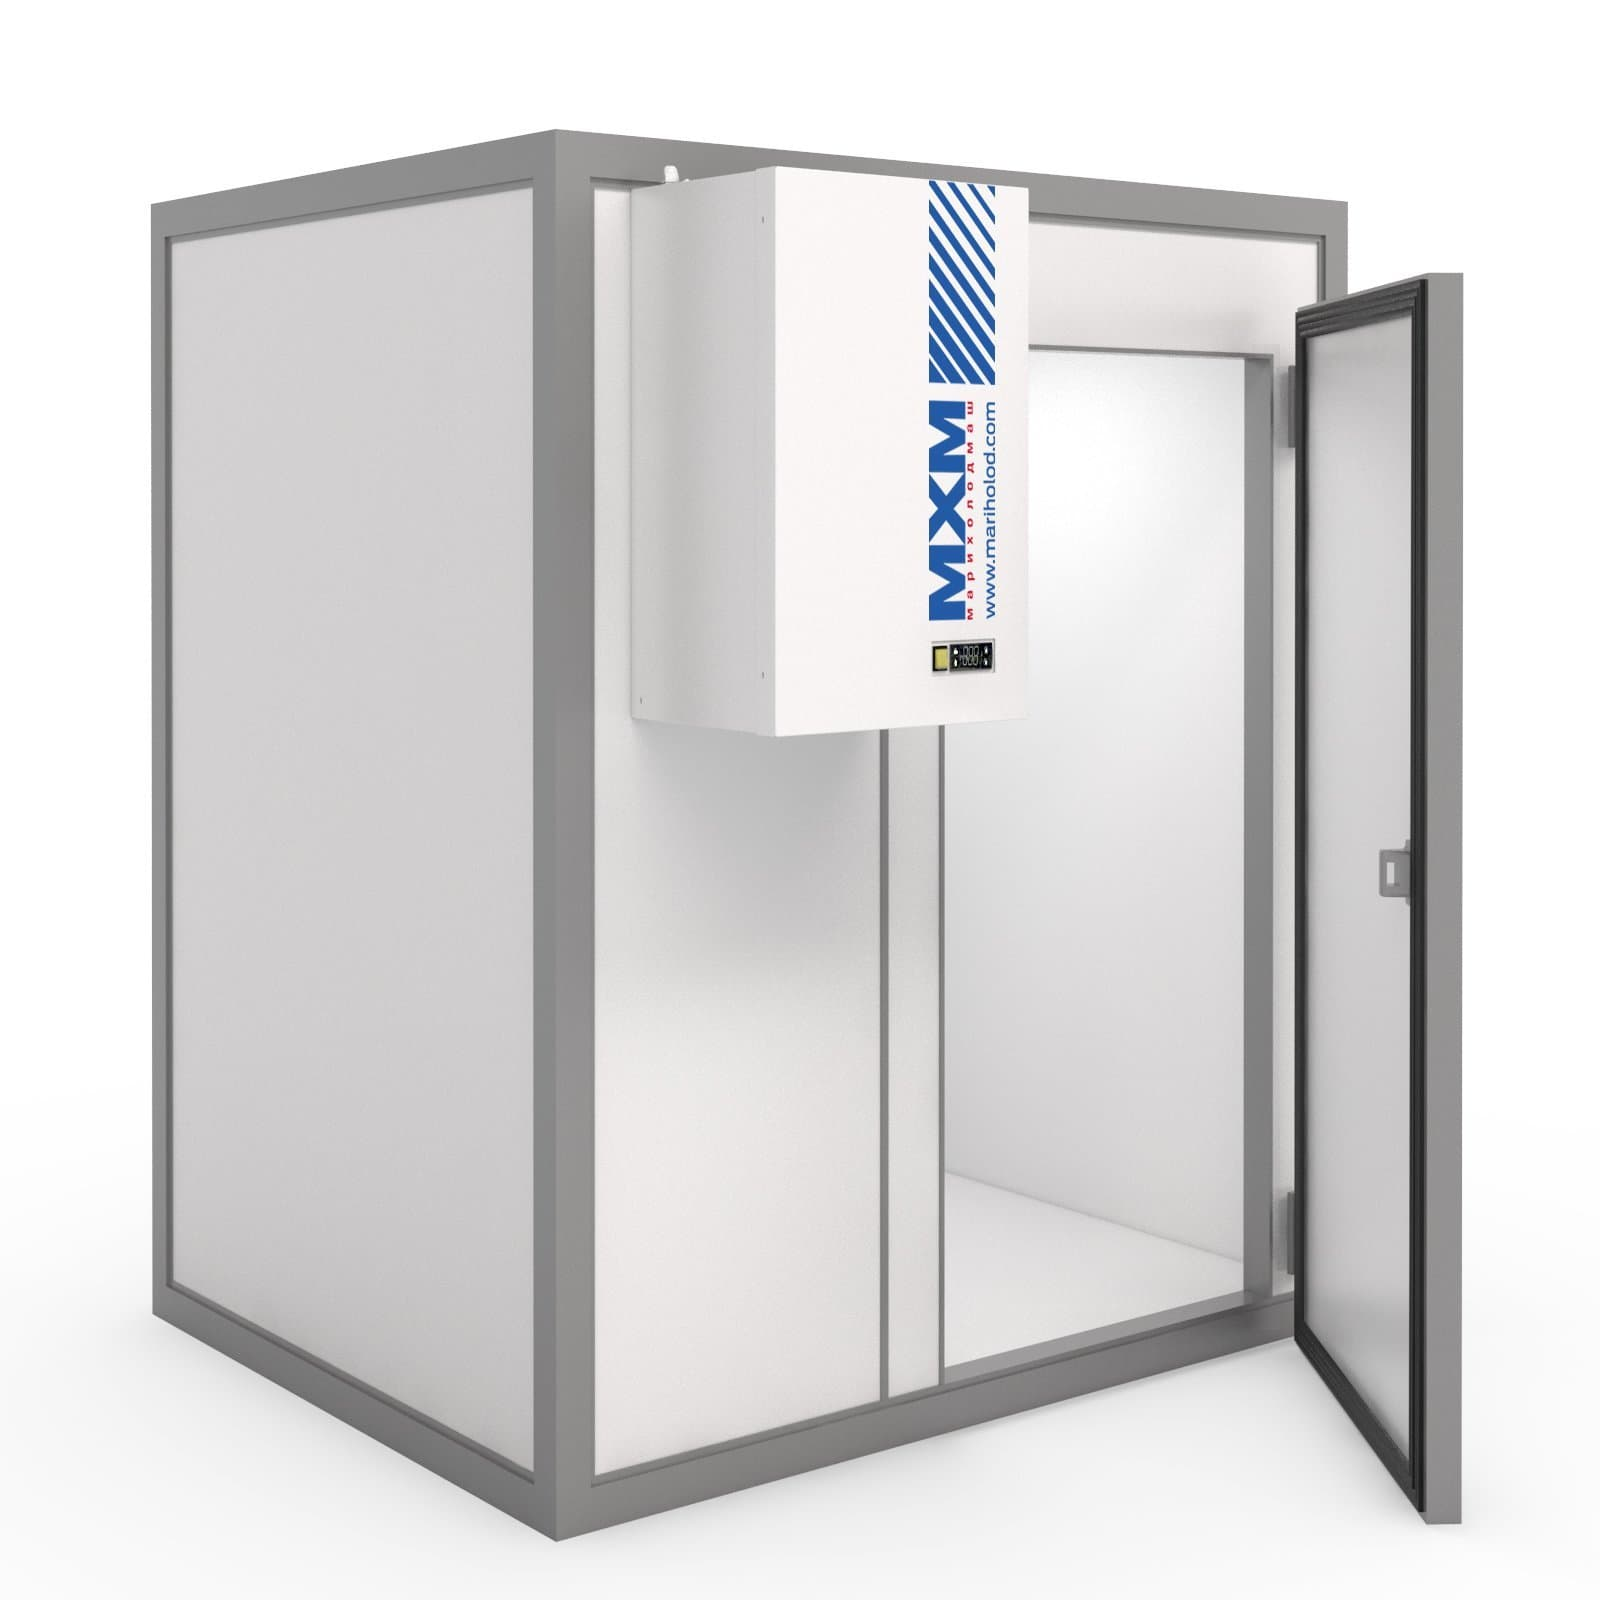 Камера холодильная МХМ КХН-17,63 1360×7360×2200